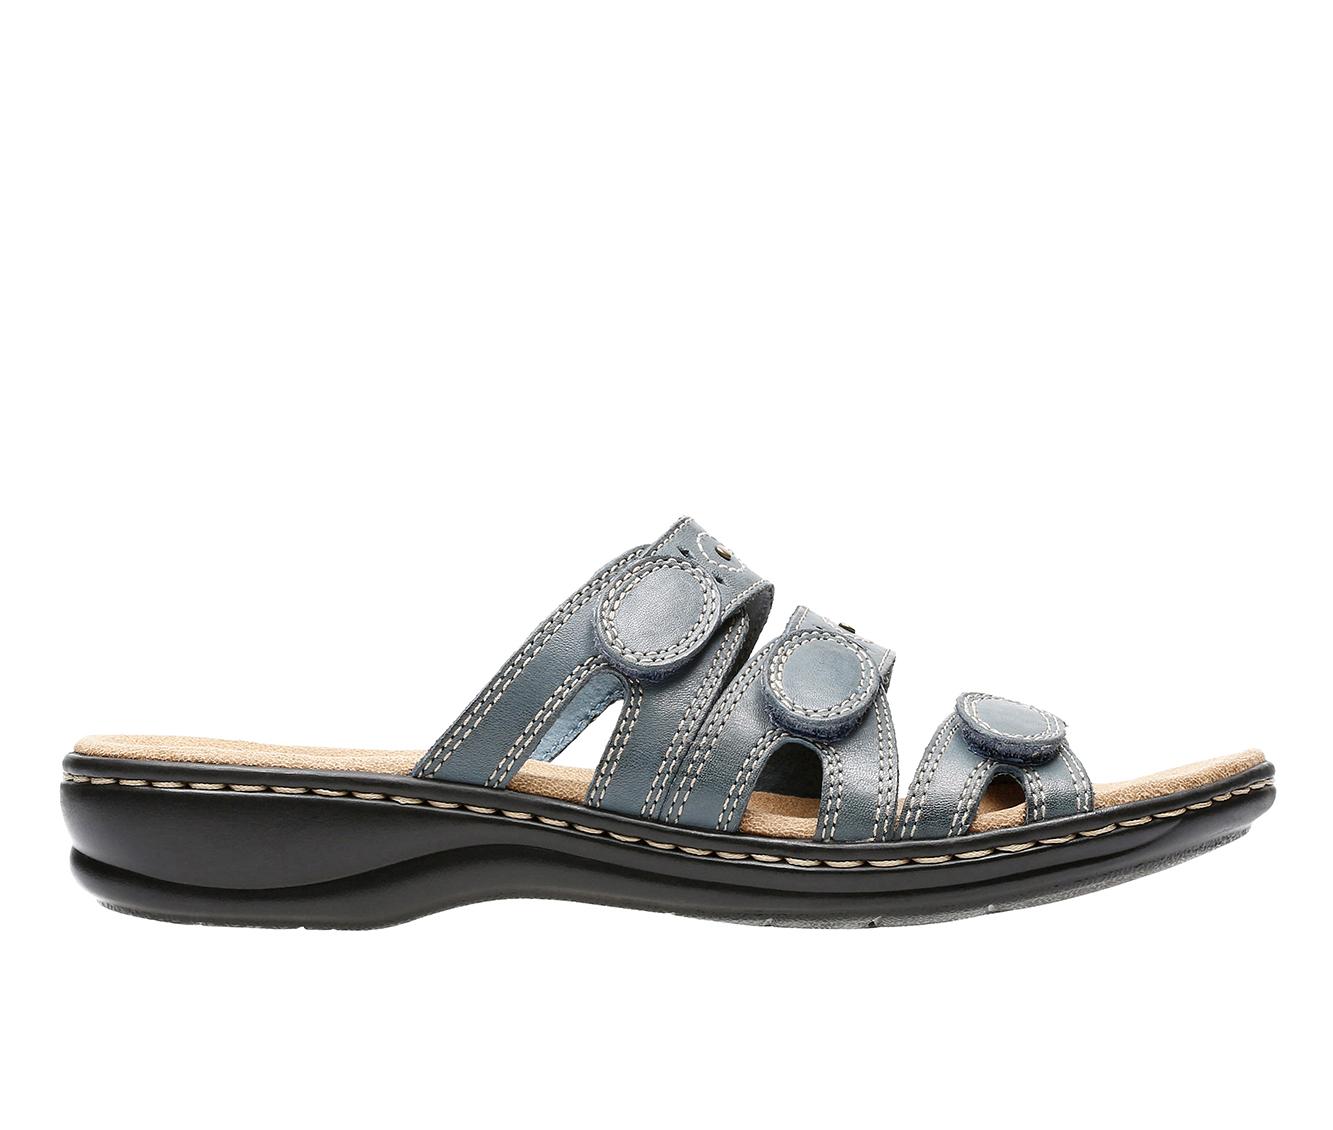 Clarks Leisa Cacti Women's Sandal (Blue Leather)